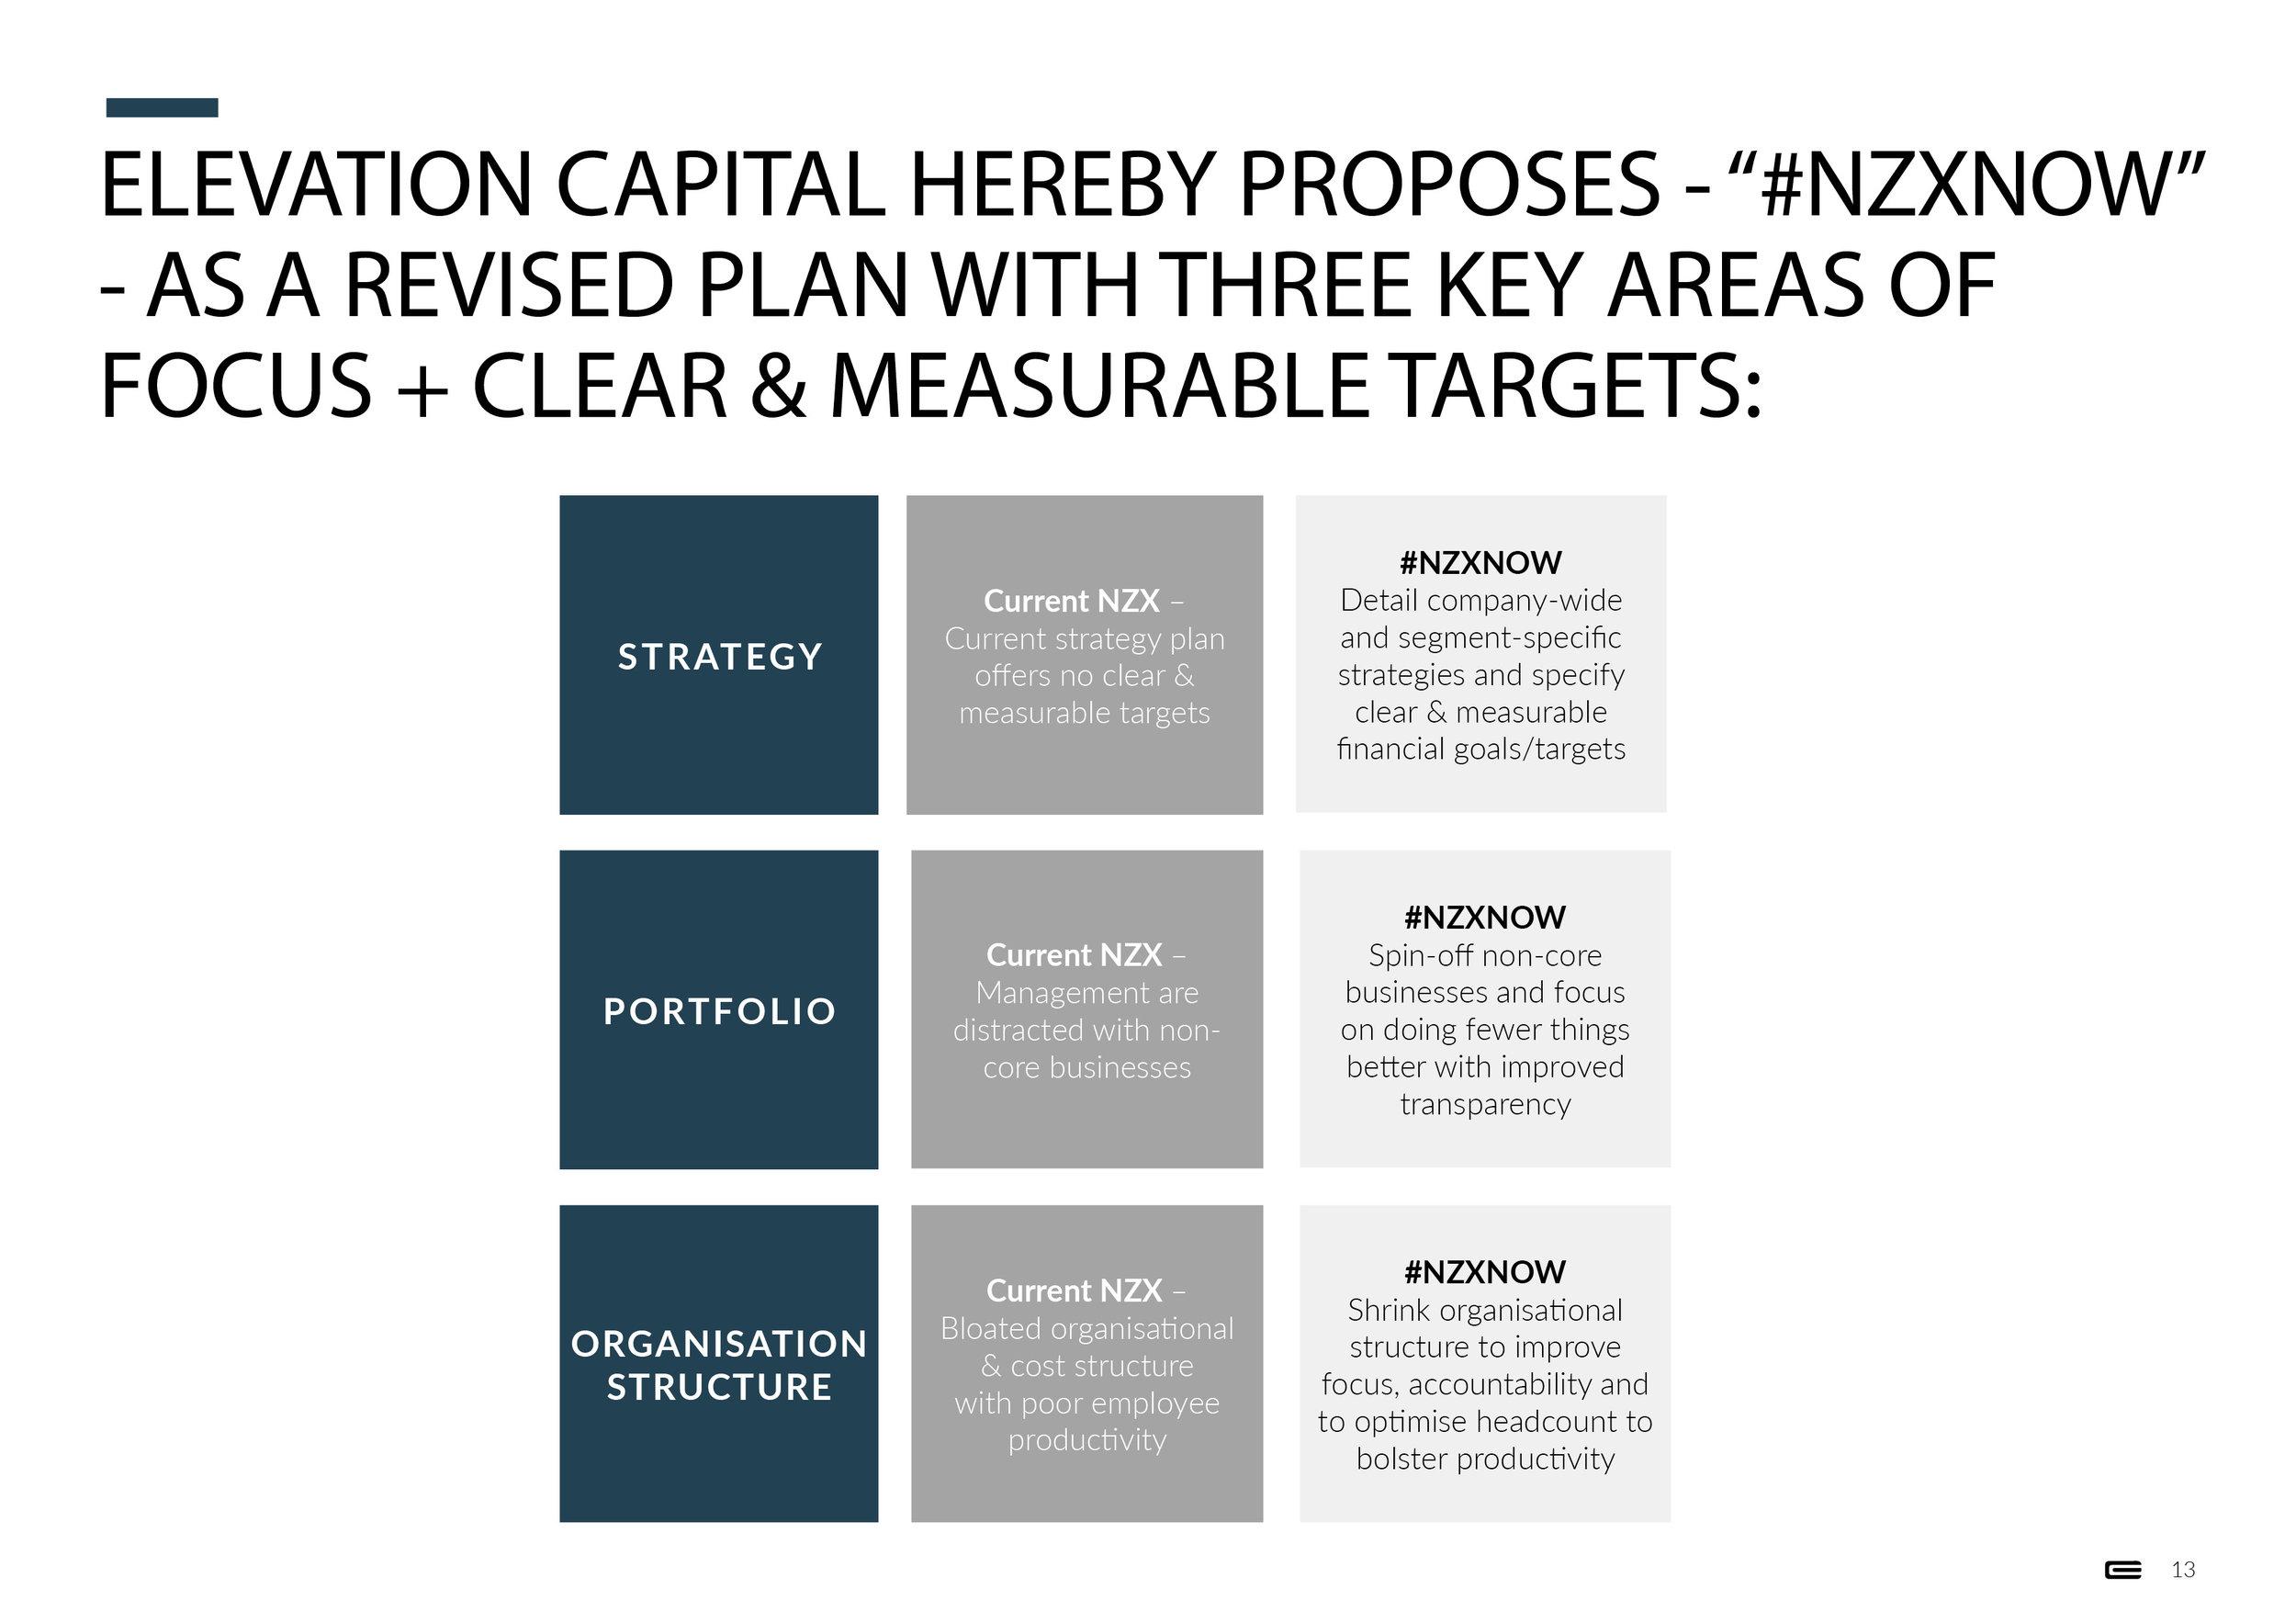 #NZXNOW - Presentation - 1 October 201813.jpg